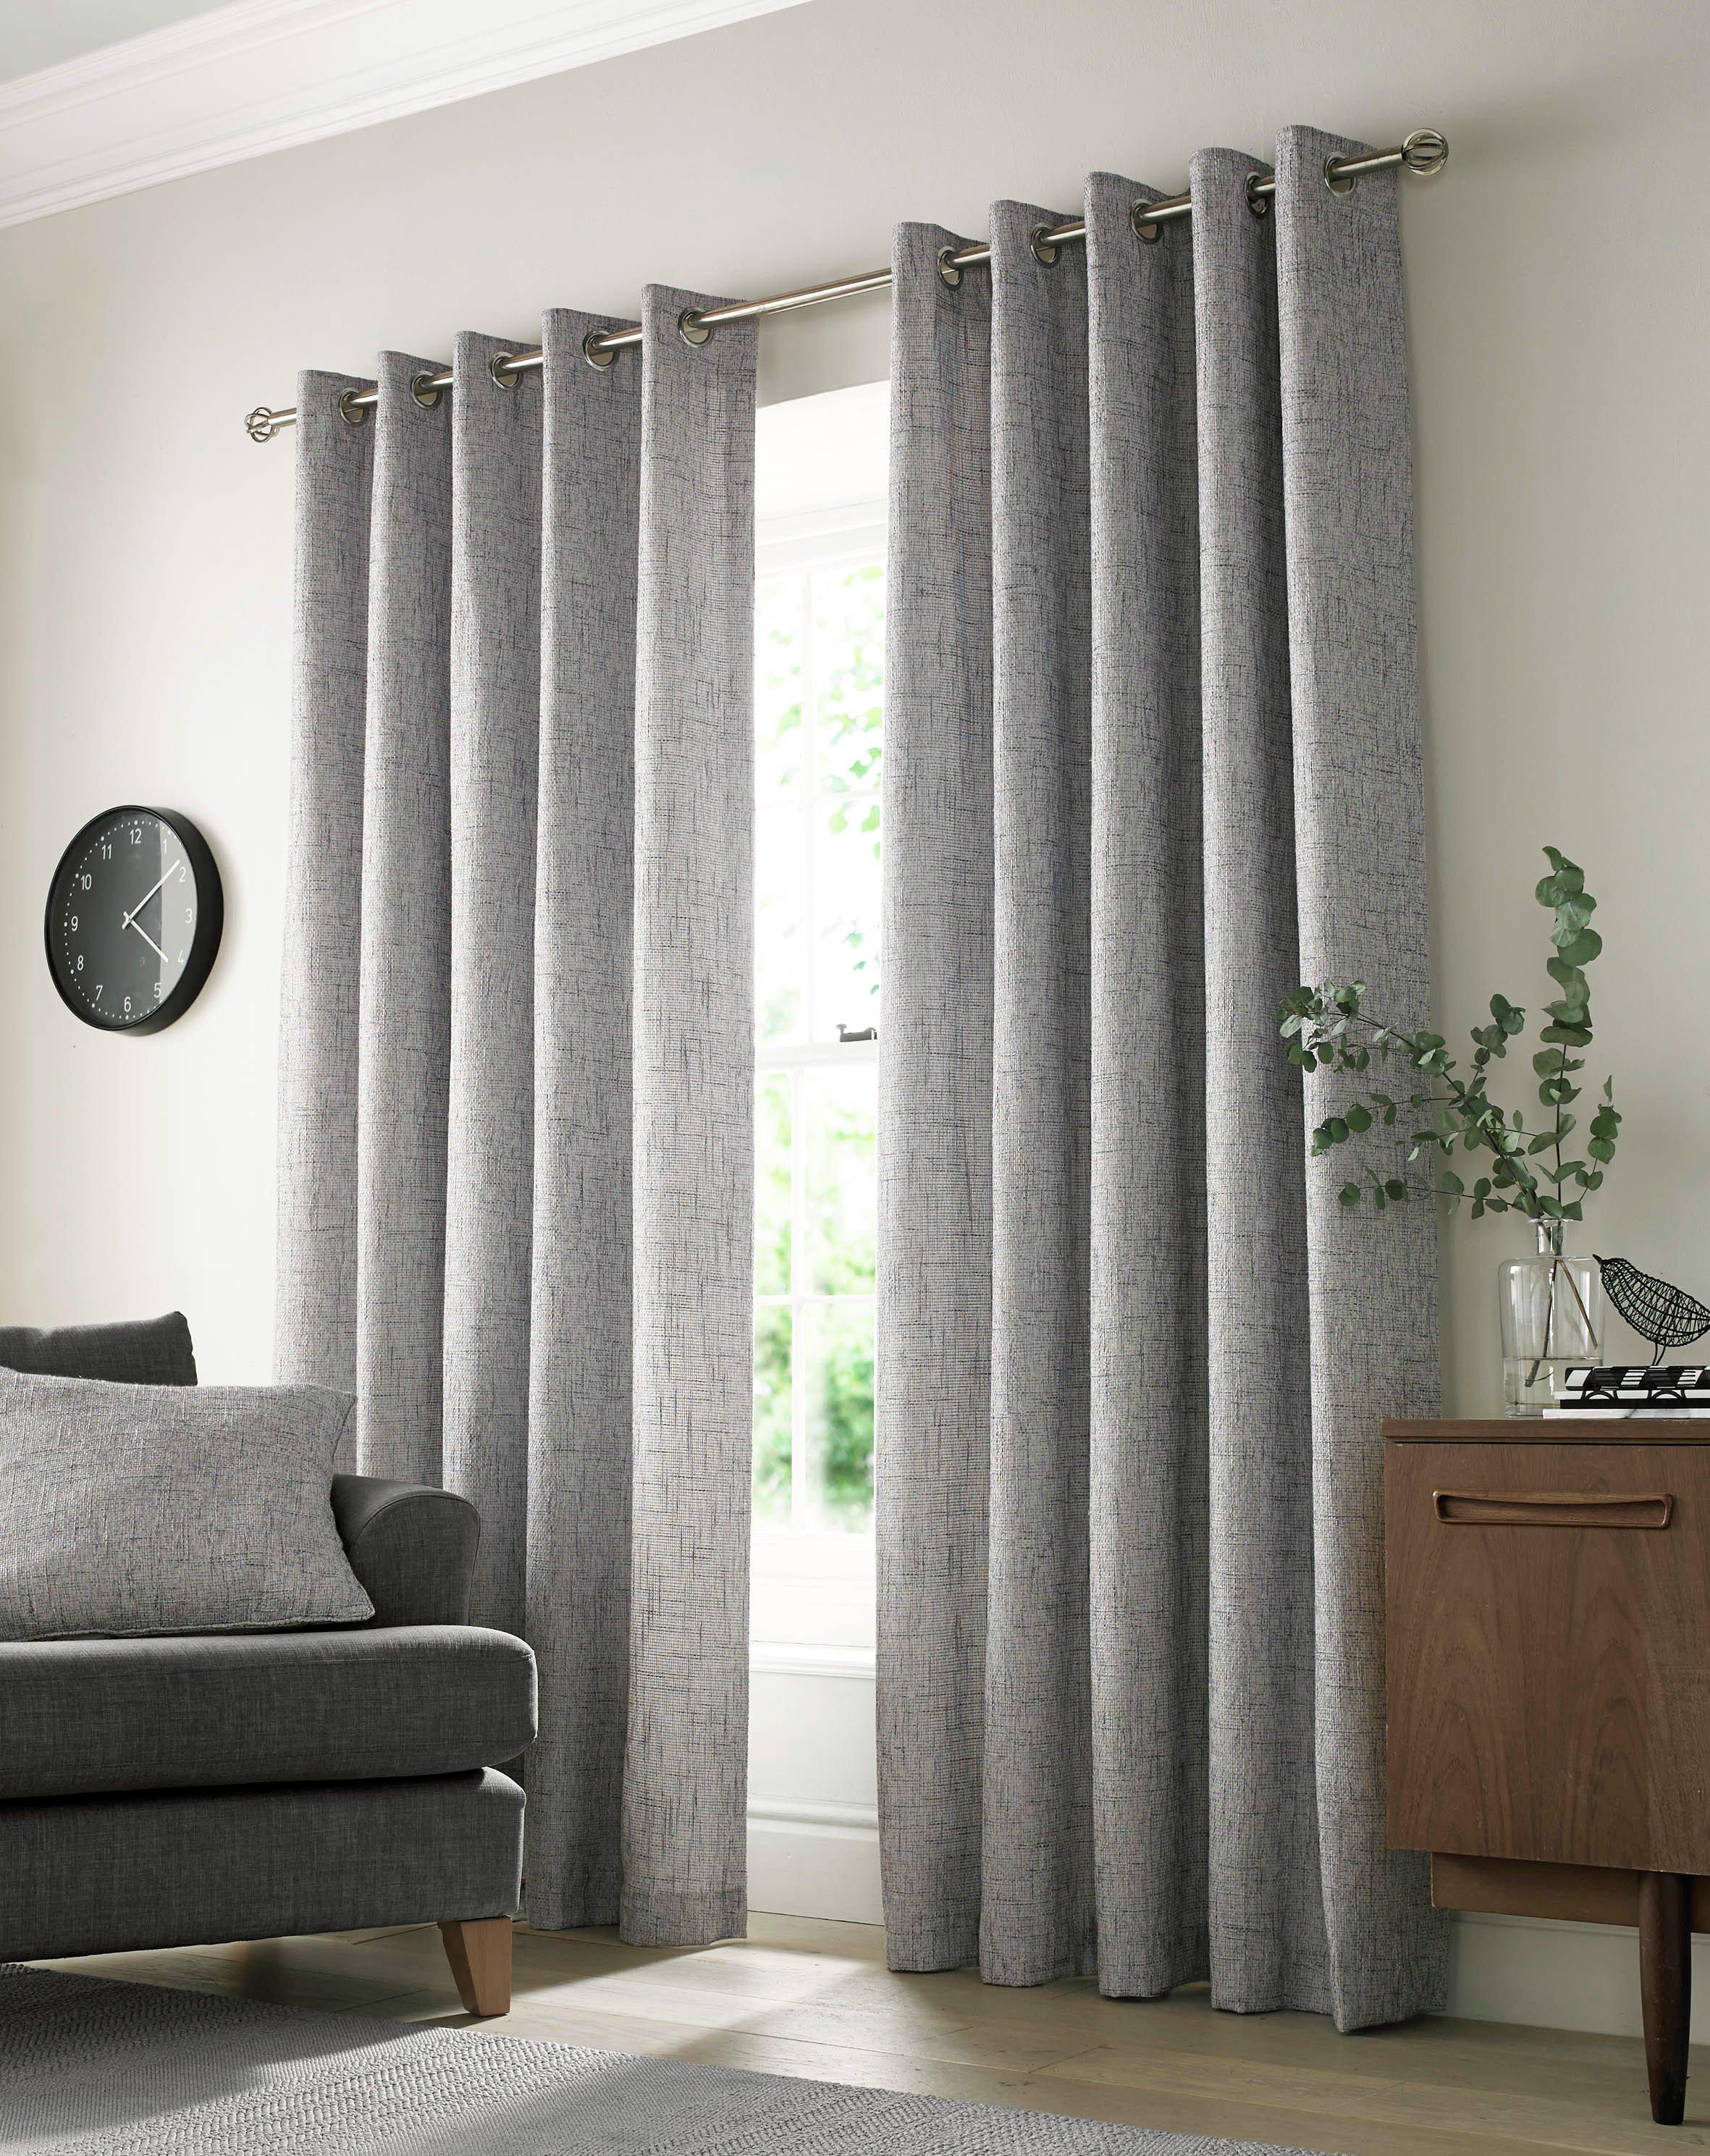 Academy Eyelet Curtains - 117x137cm - Grey.